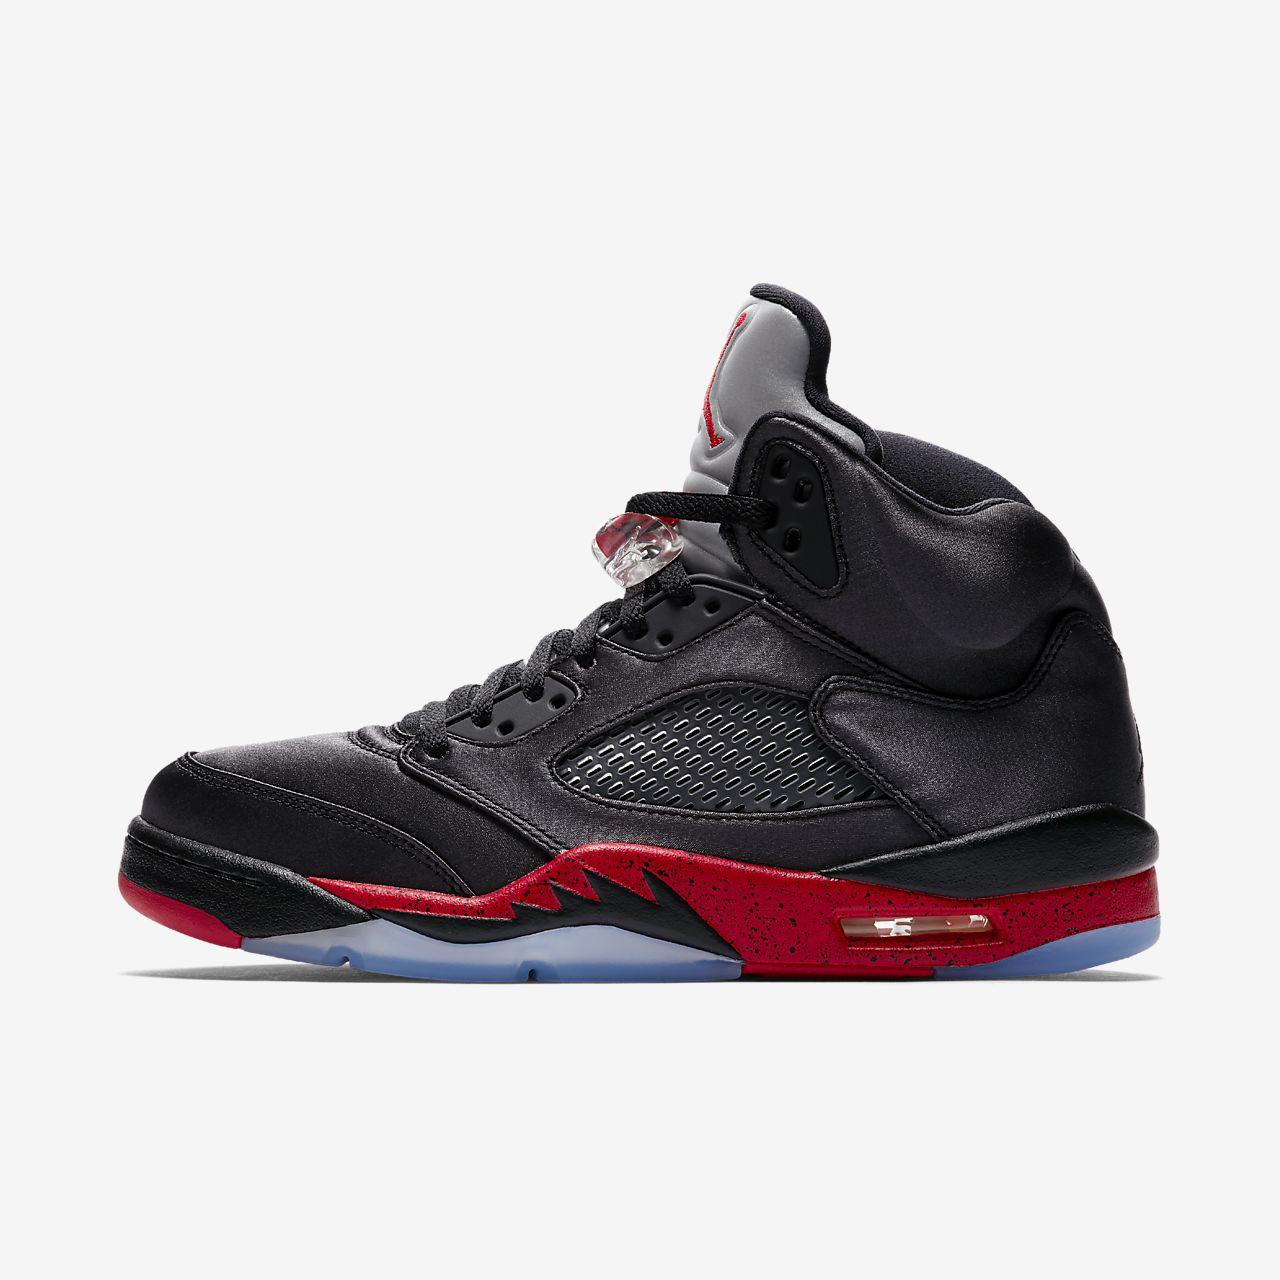 best sneakers b7f95 c4324 ... coupon for air jordan 5 retro sko til mænd a1061 cc7a8